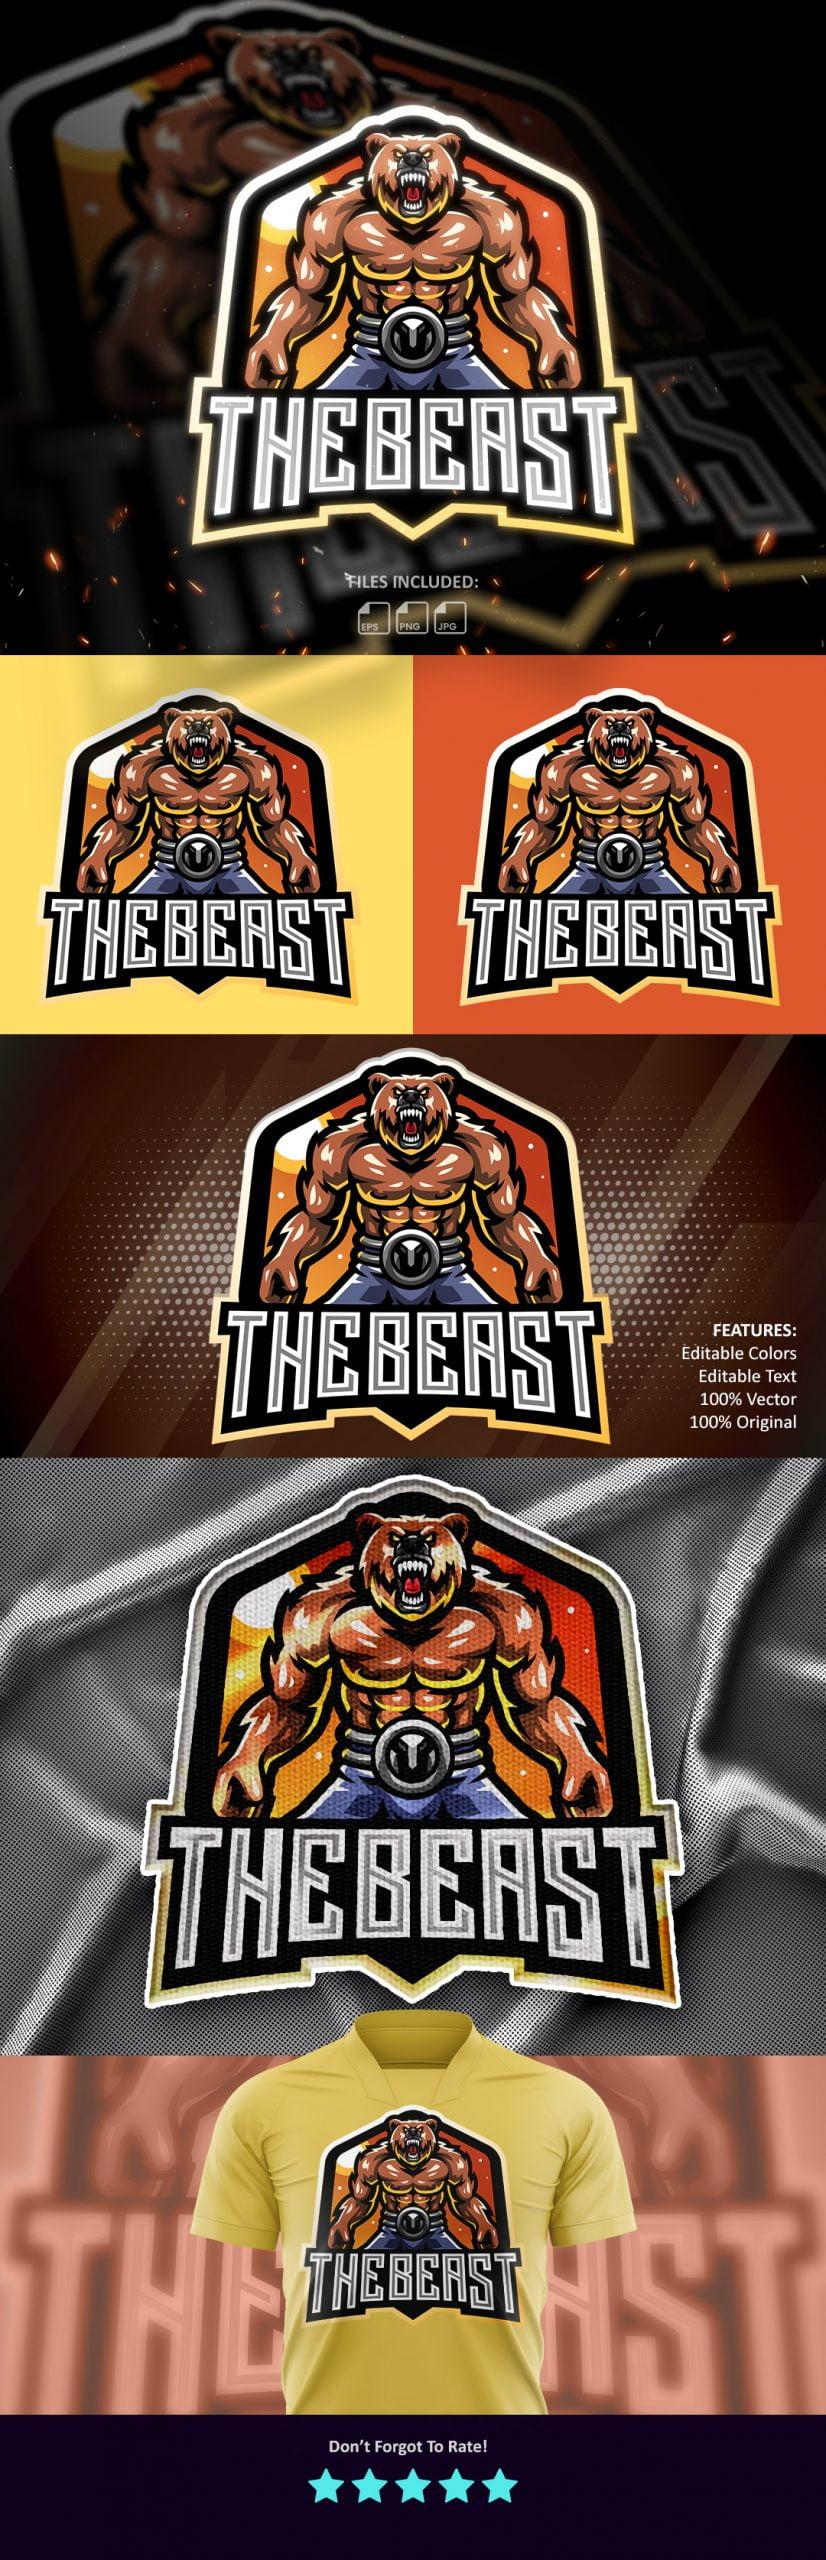 Free-The-Beast-Esports-Mascot-Logo-Template